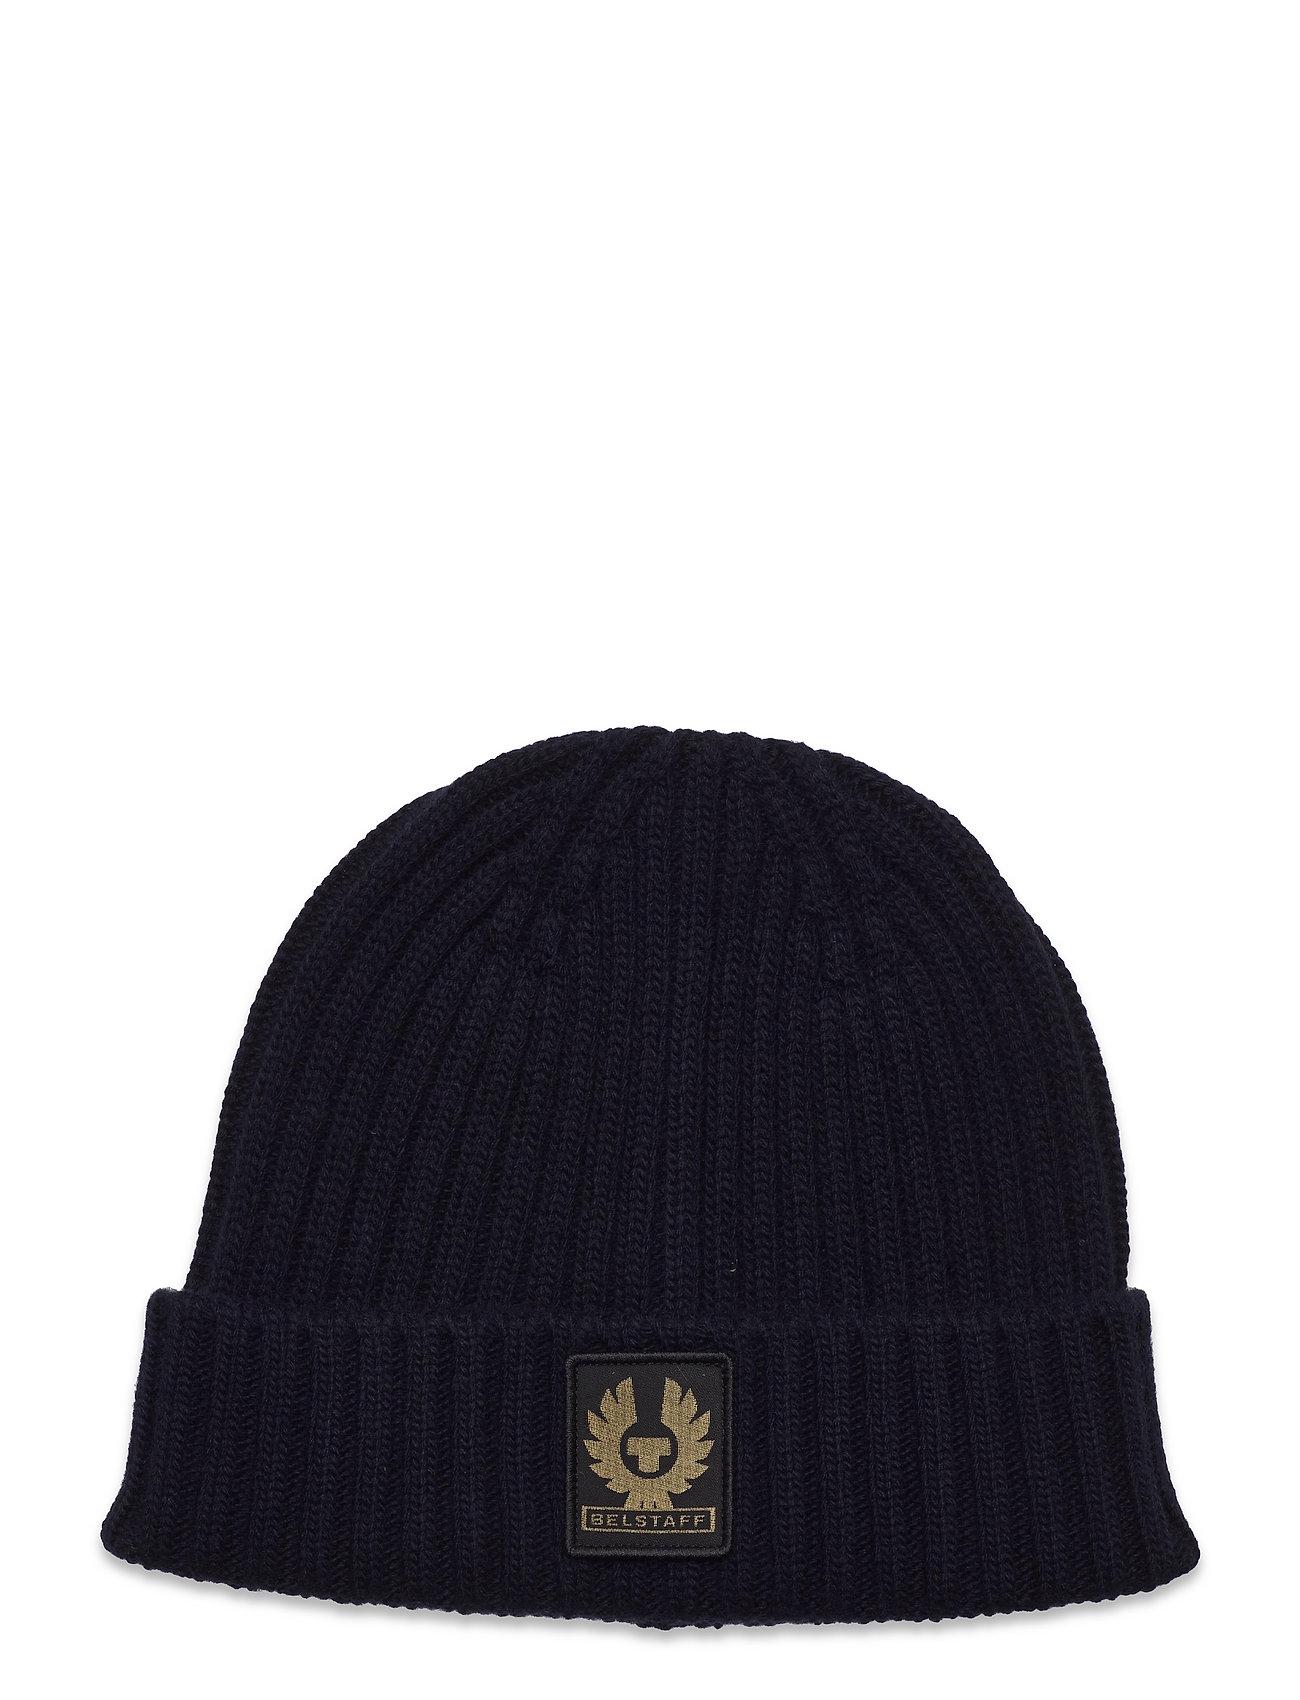 Watch Hat W/Patch Accessories Headwear Beanies Blå Belstaff